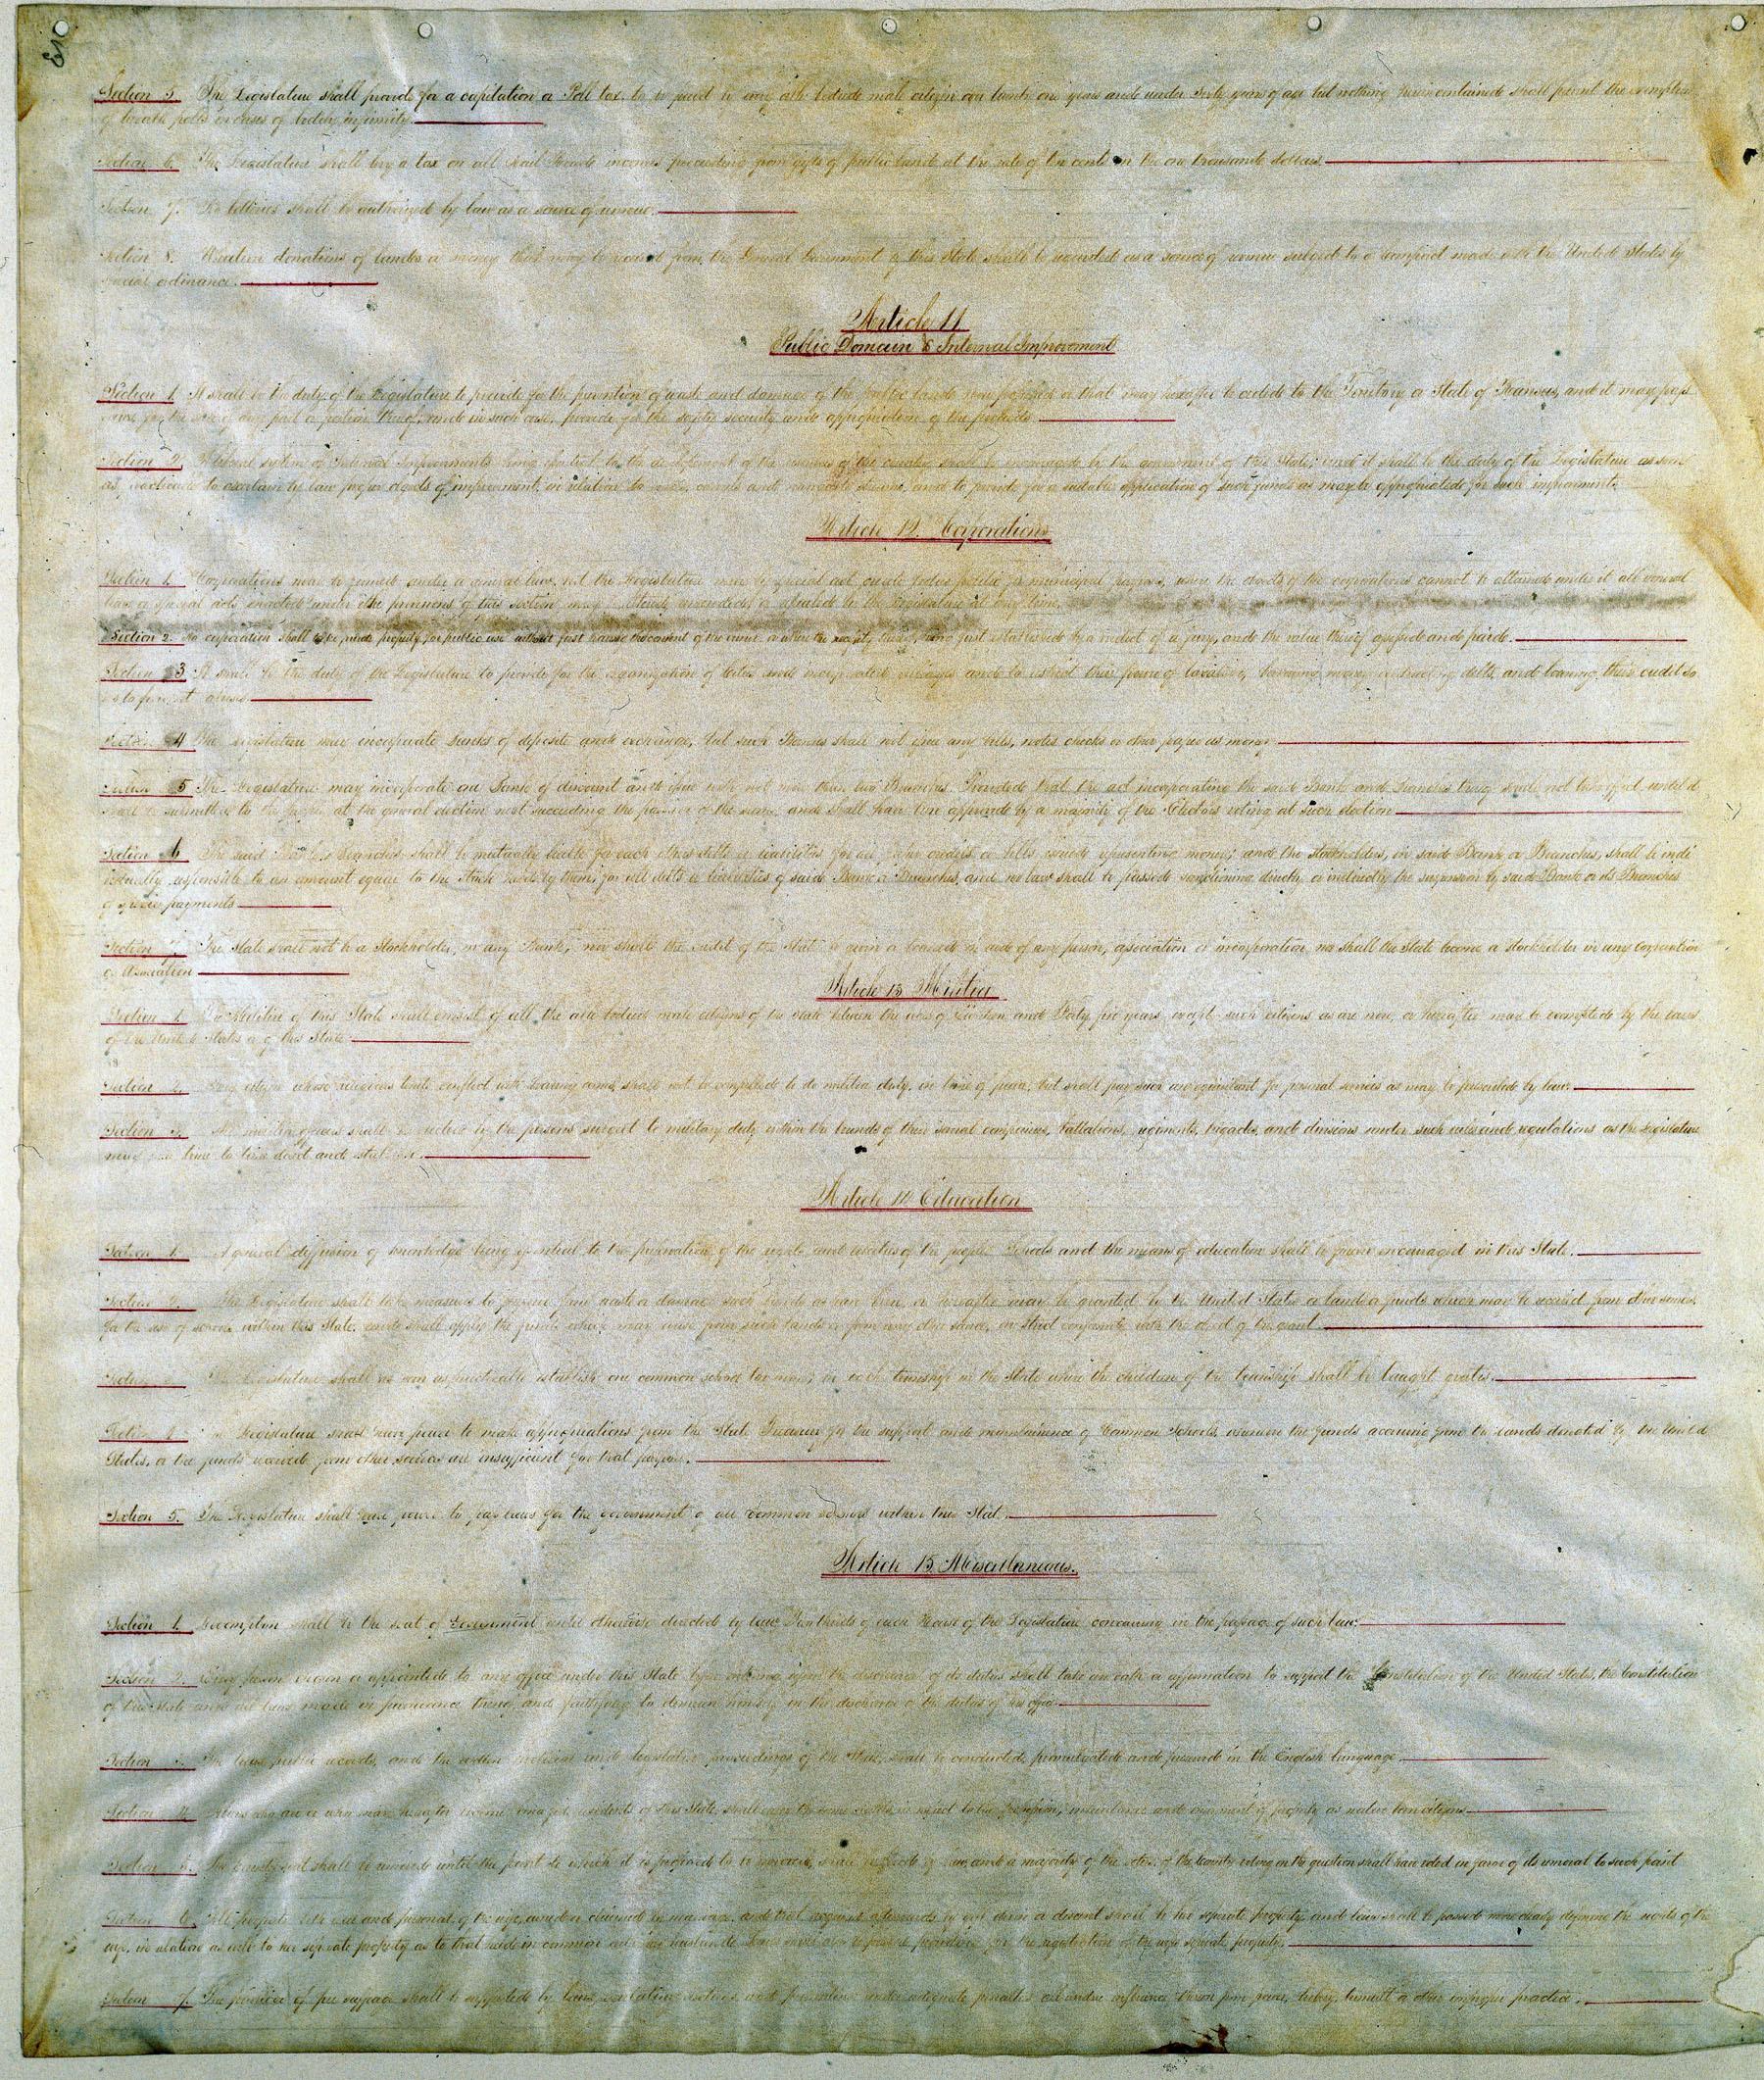 Lecompton Constitution - 5